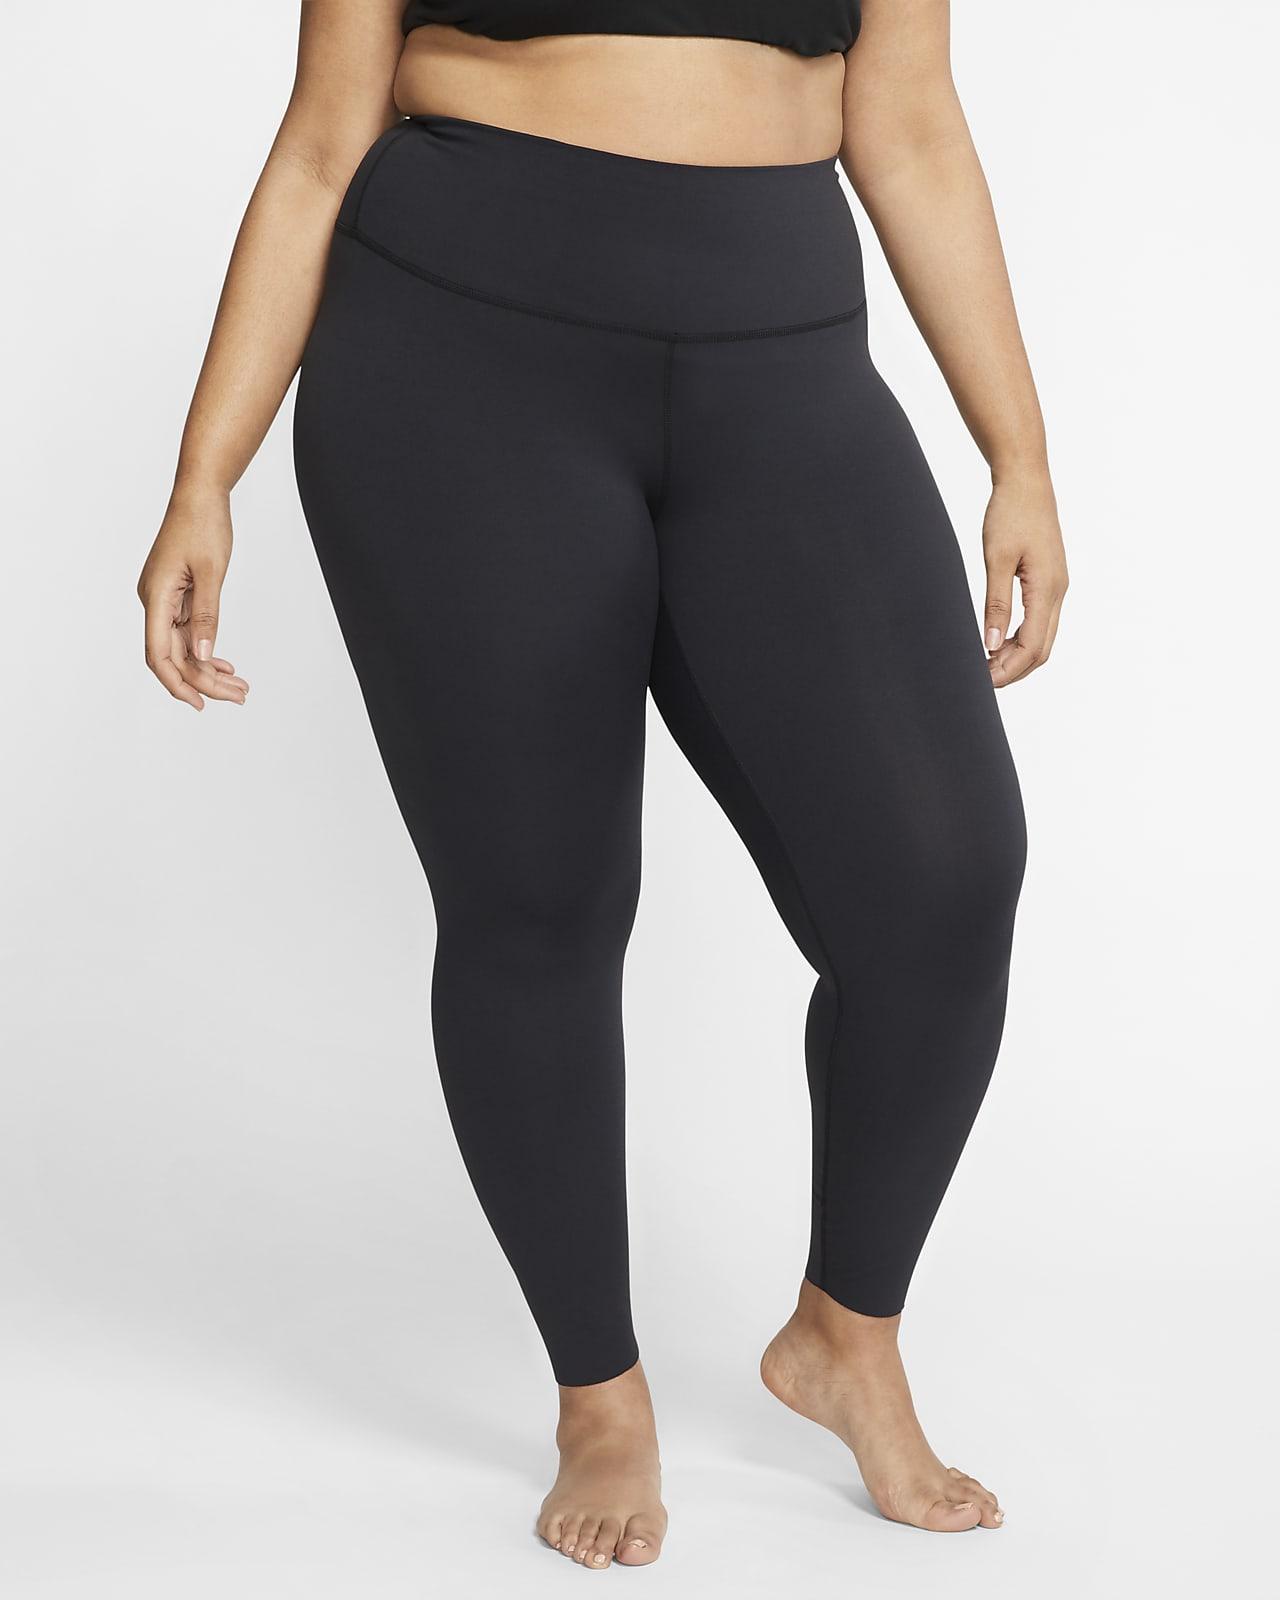 Nike Yoga Luxe Women's High-Waisted 7/8 Infinalon Leggings (Plus Size)